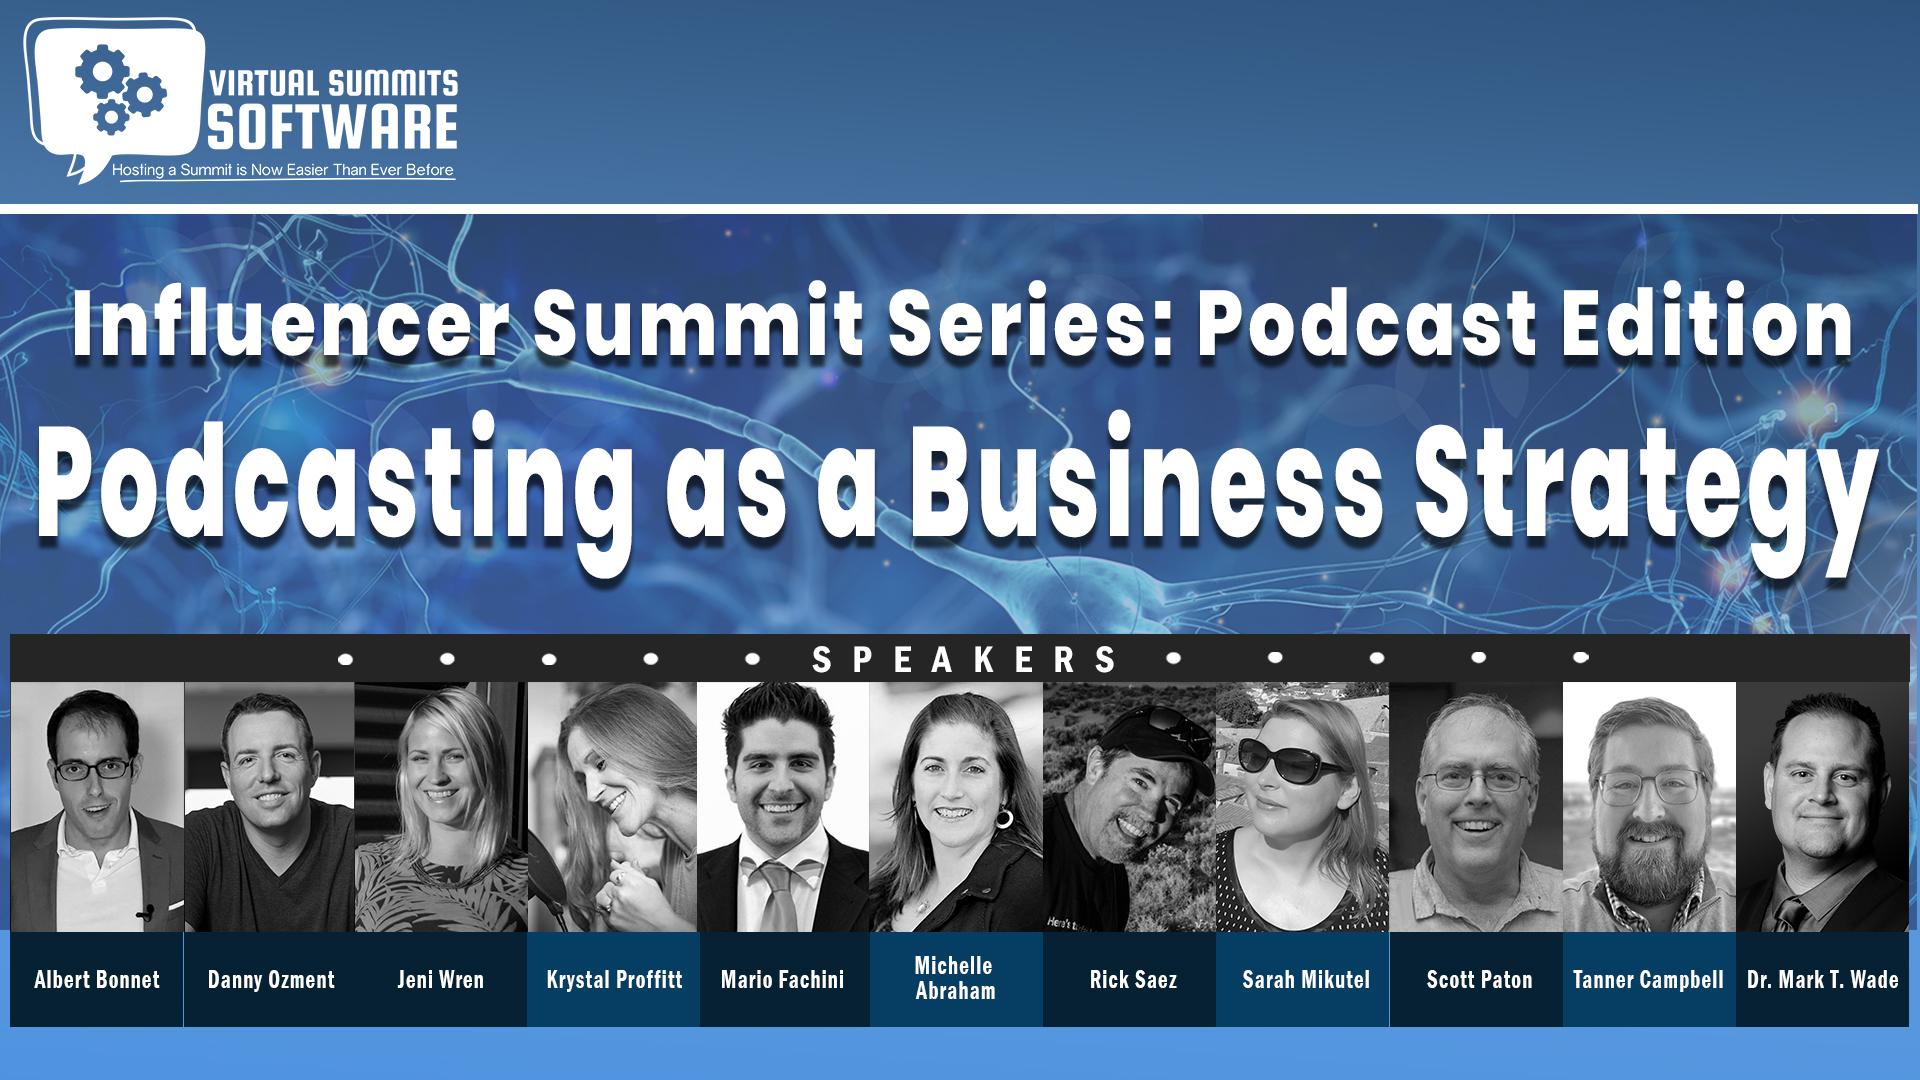 Podcast Summit Series